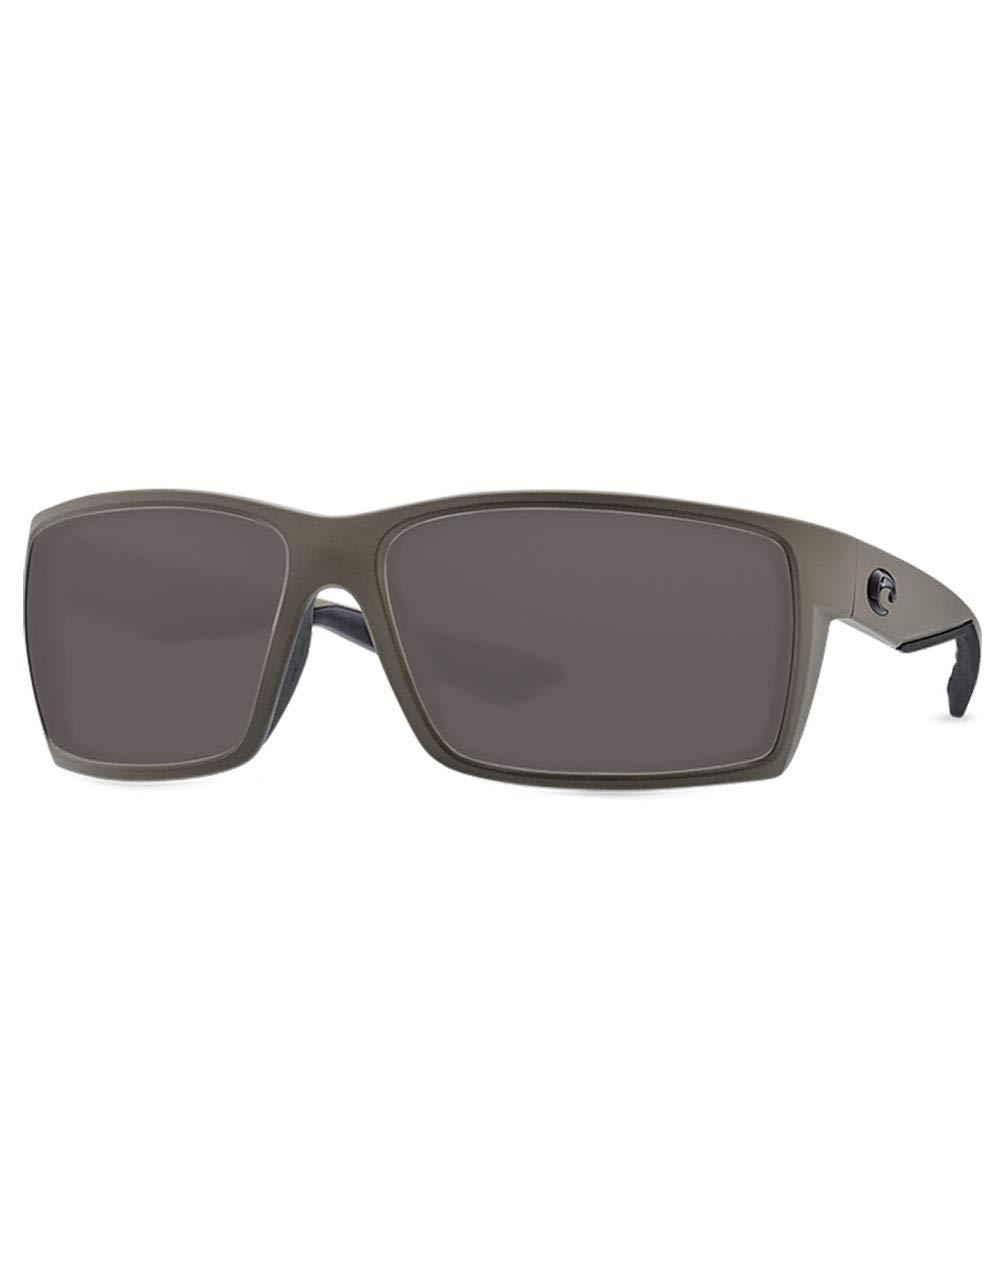 Costa Reefton Plastic Frame Gray Plastic Lens Unisex Sunglasses RFT198OGP